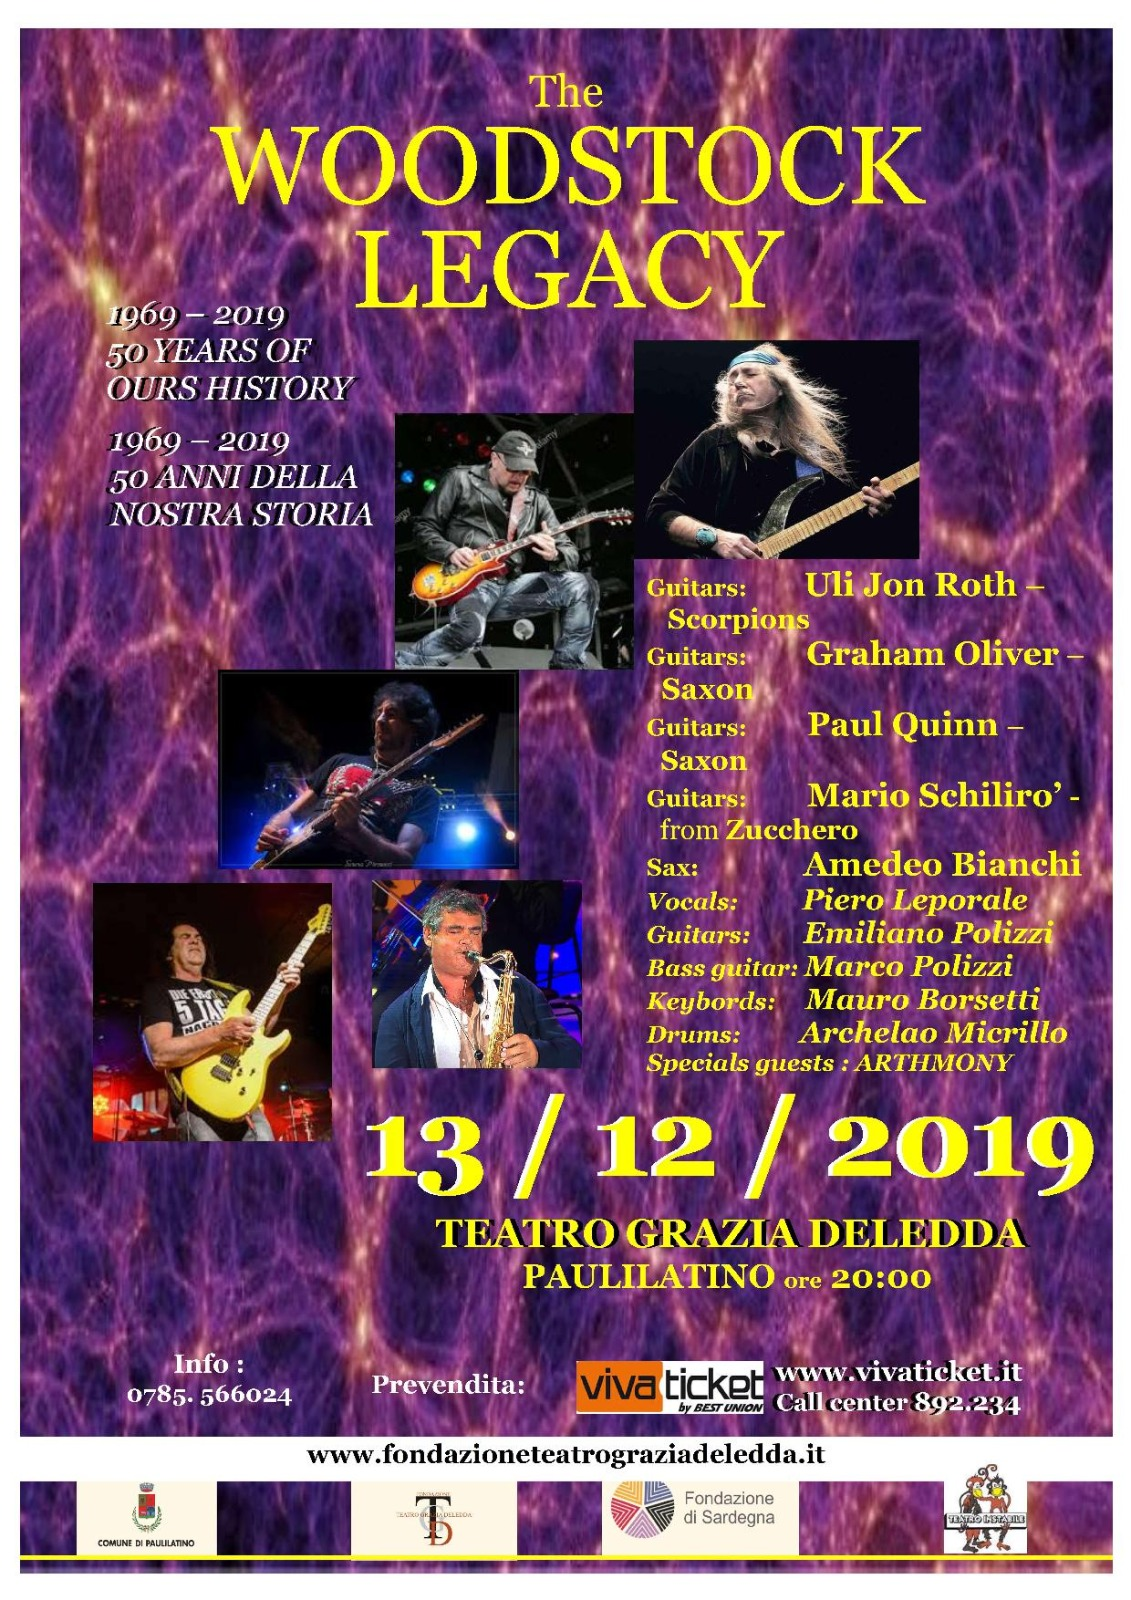 Woodstock Legacy Paulilatino